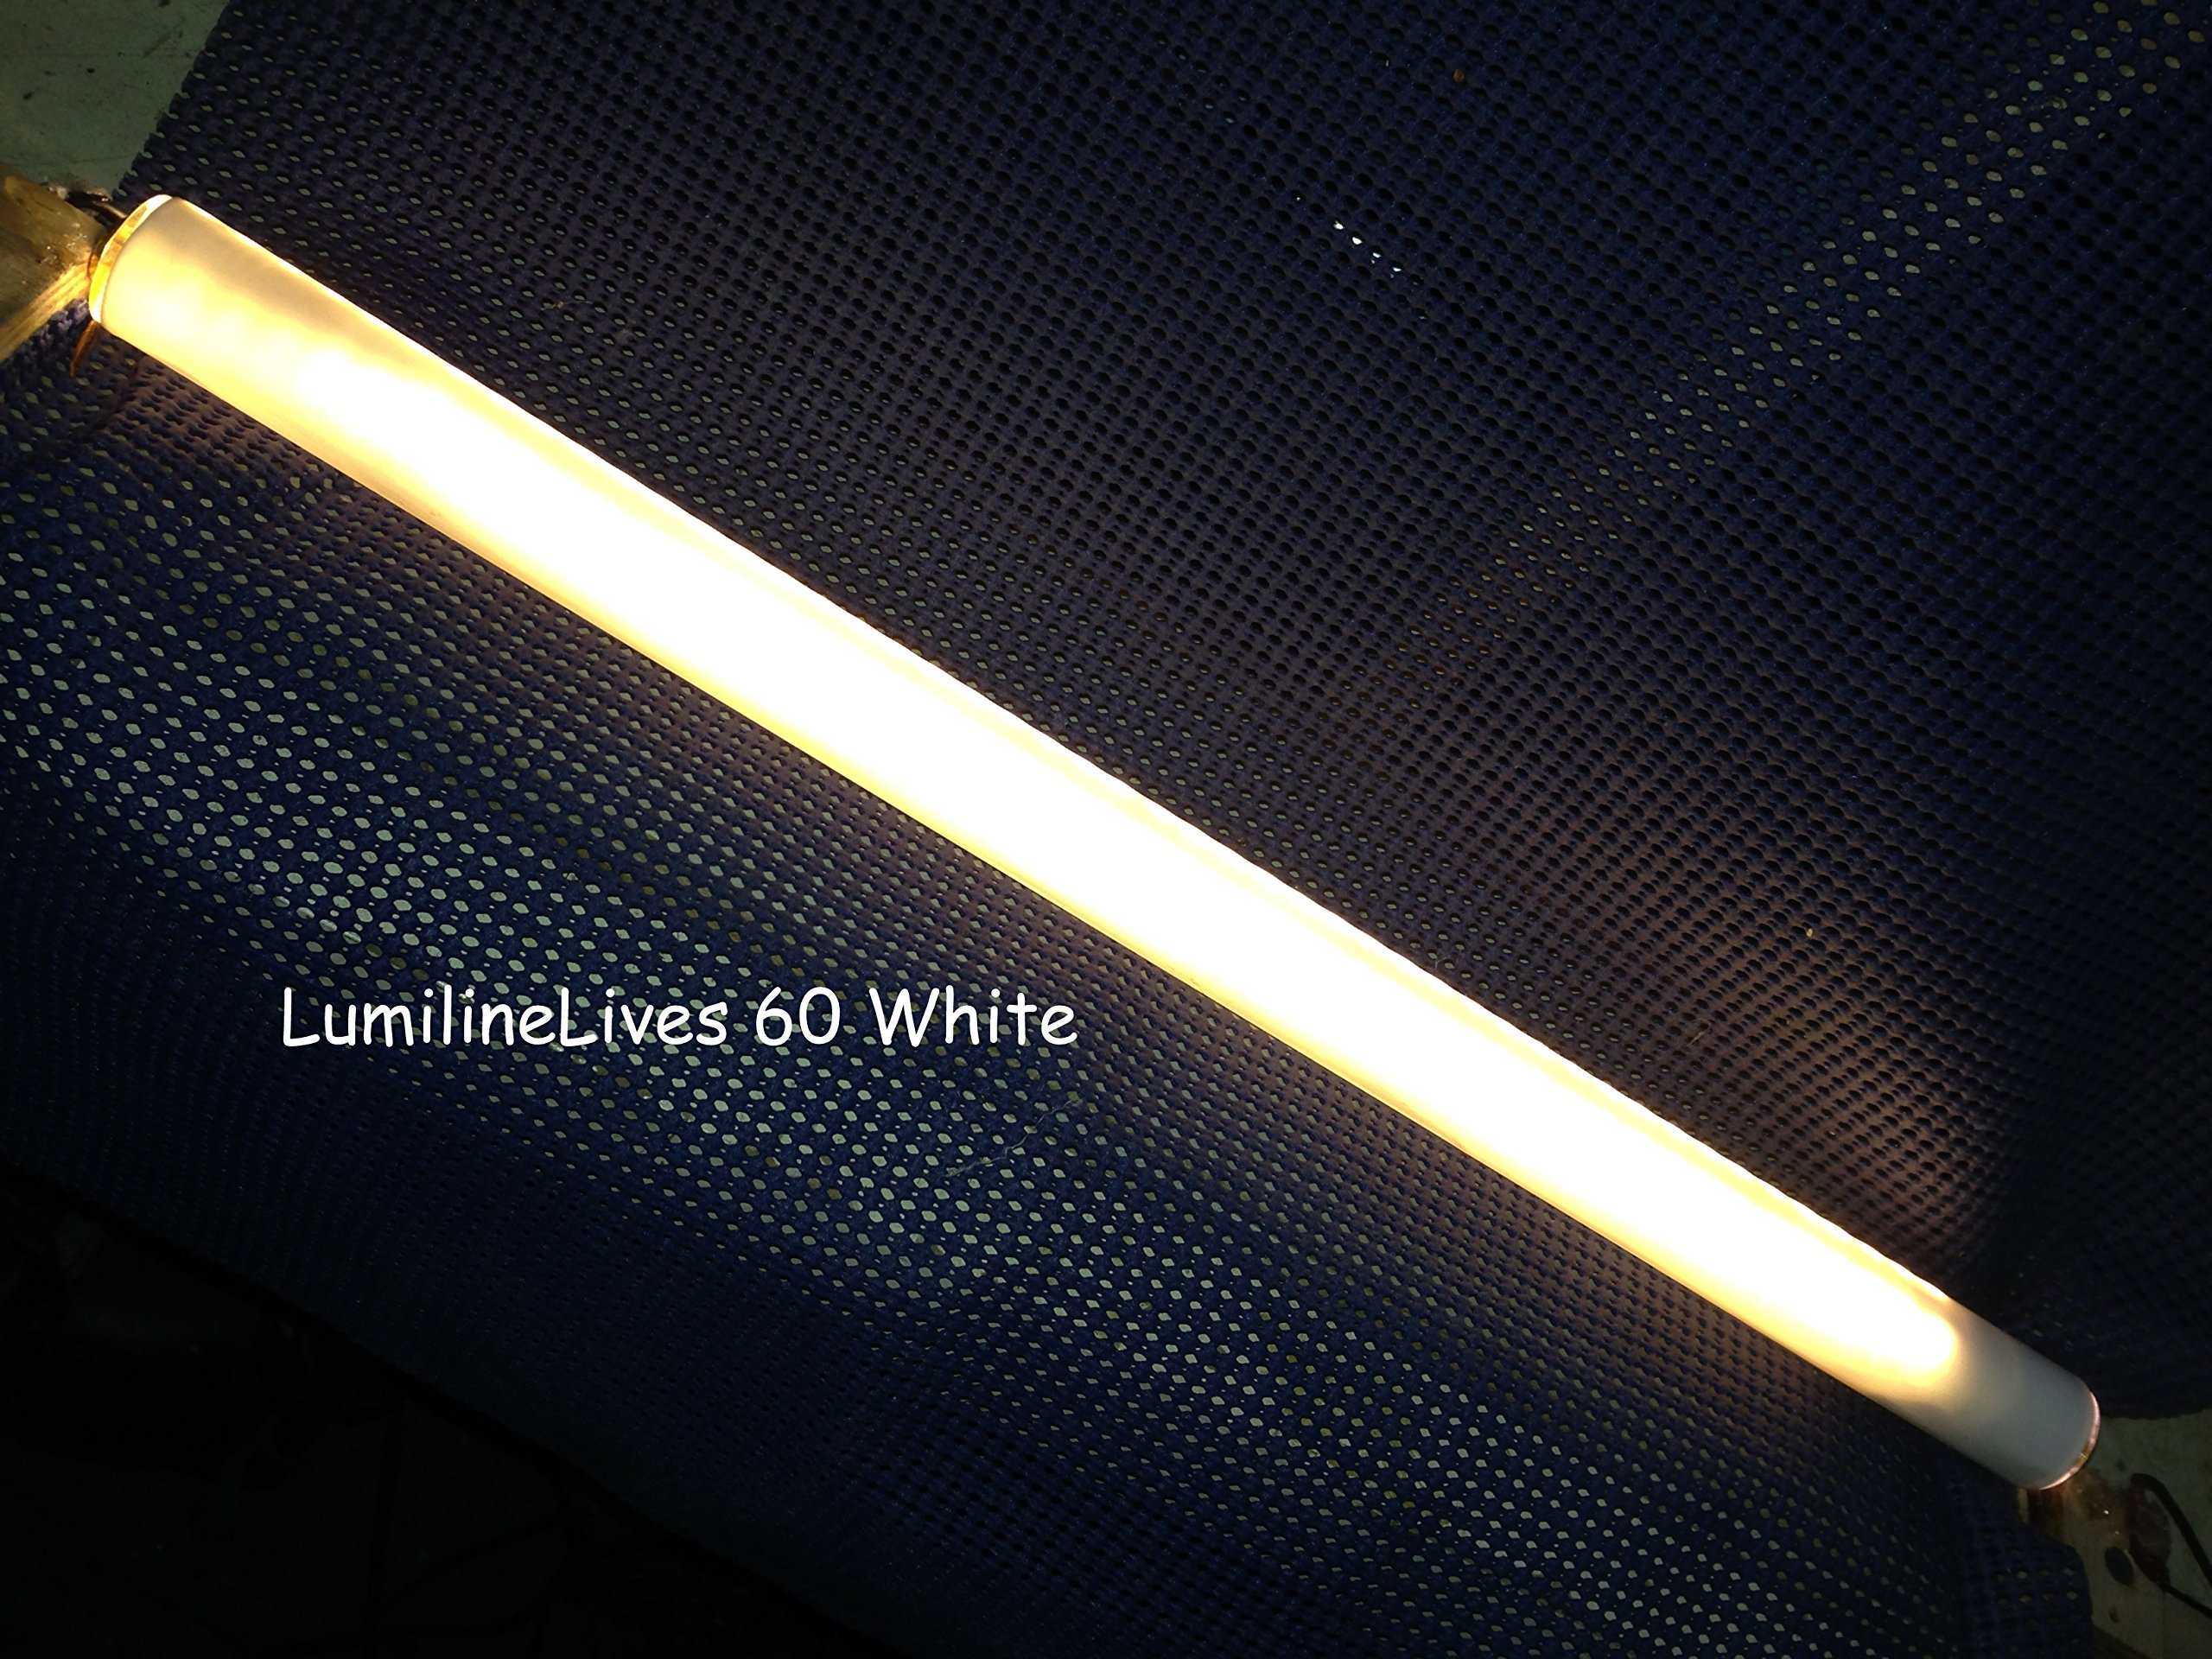 GE 17266 - L60/W Lumiline Special Application Light Bulb